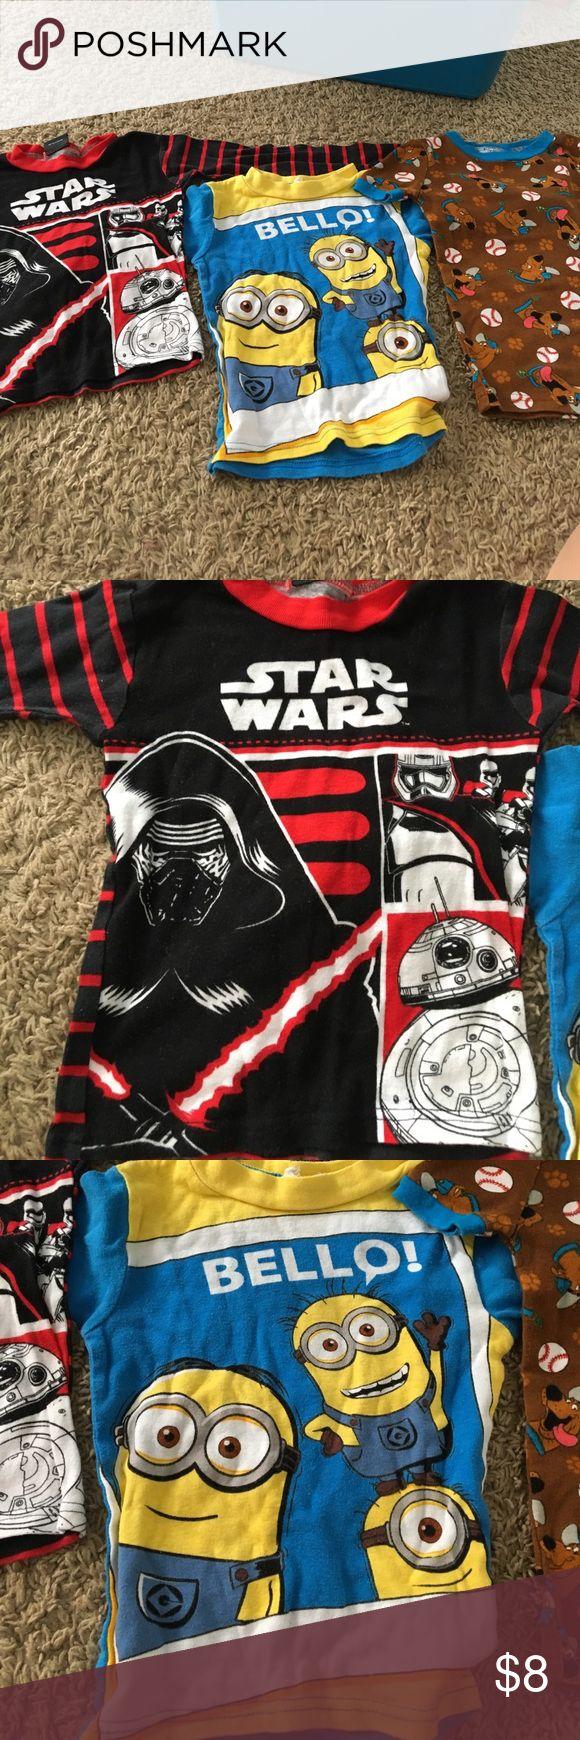 Boys pj tops Star Wars long sleeve. Minions long sleeve. Scooby doo t shirt. Sold together. Fits small. Pajamas Pajama Tops